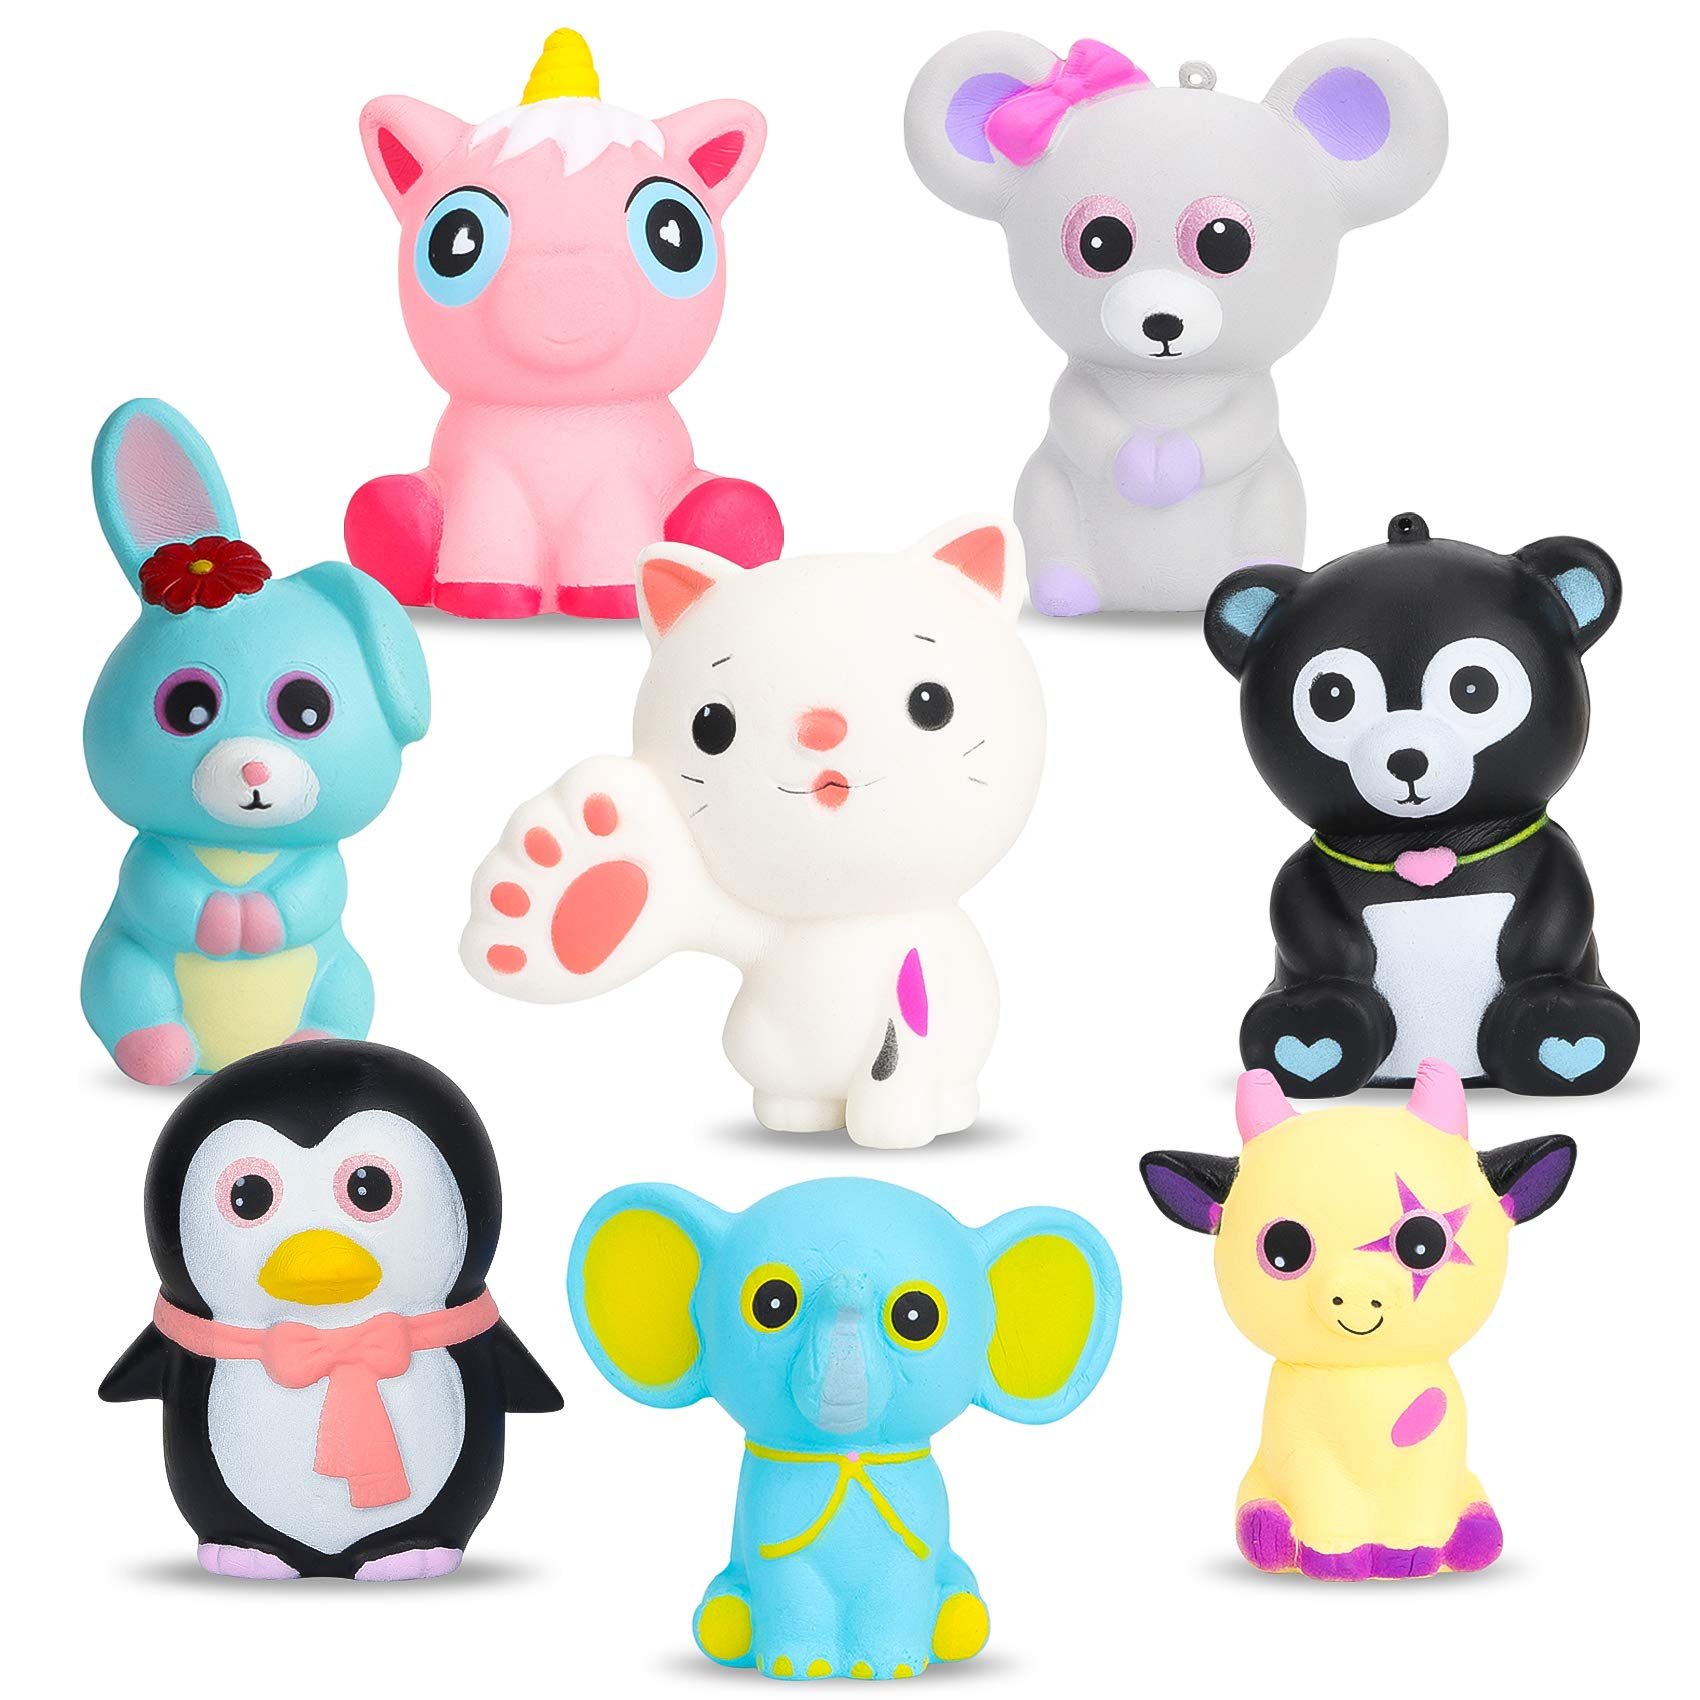 BeYumi Slow Rising Squishy, 8 PCS Colorful Animal Squishy Toys, Kawaii Mouse + Black Bear + Pink Unicorn + Elephant + Rabbit + Cow + Penguin + Cat Cream Scented Simulation Cute Animals Toys